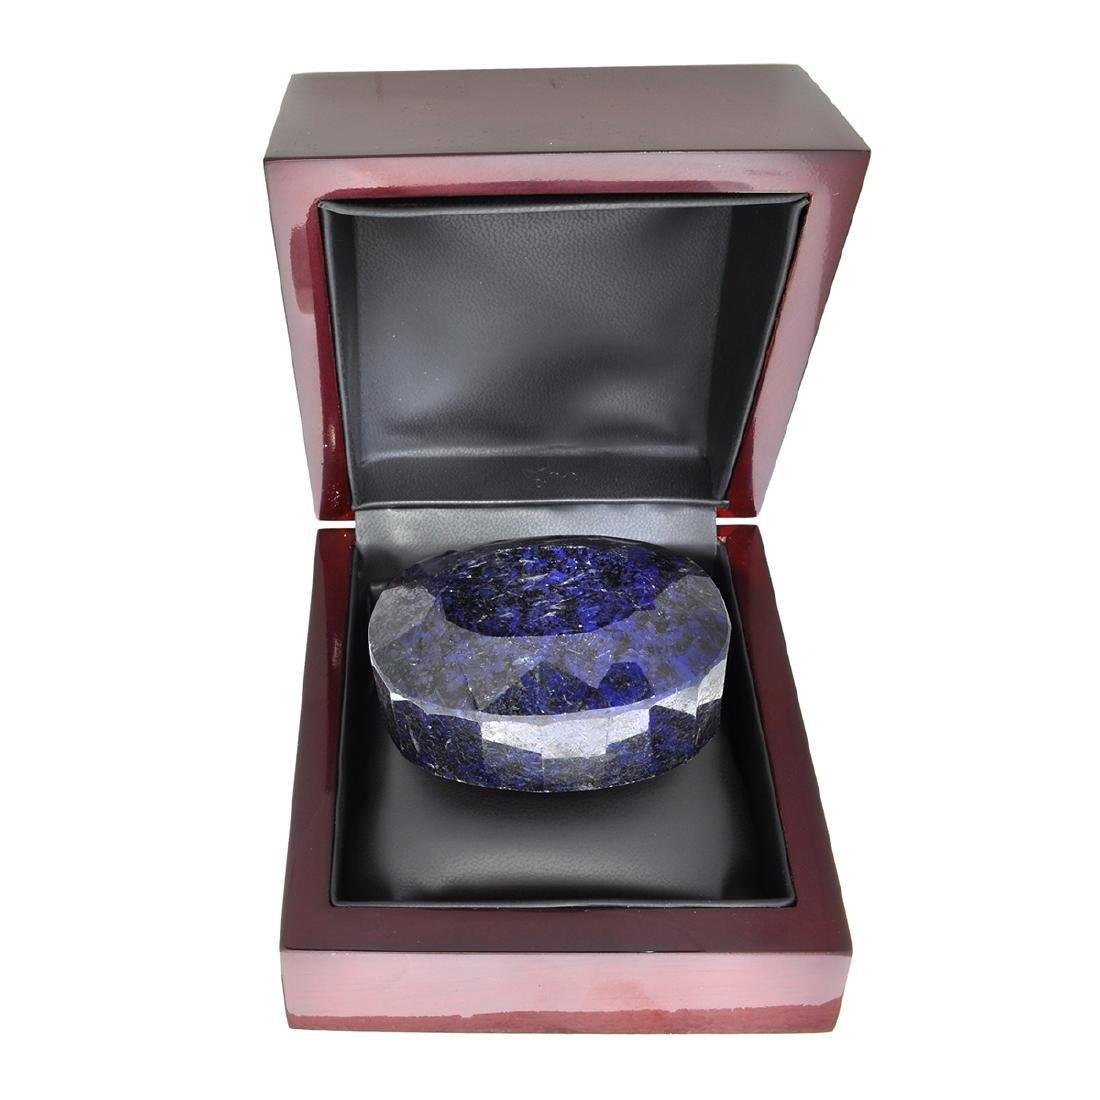 APP: 4.8k 1,918.00CT Oval Cut Blue Sapphire Gemstone